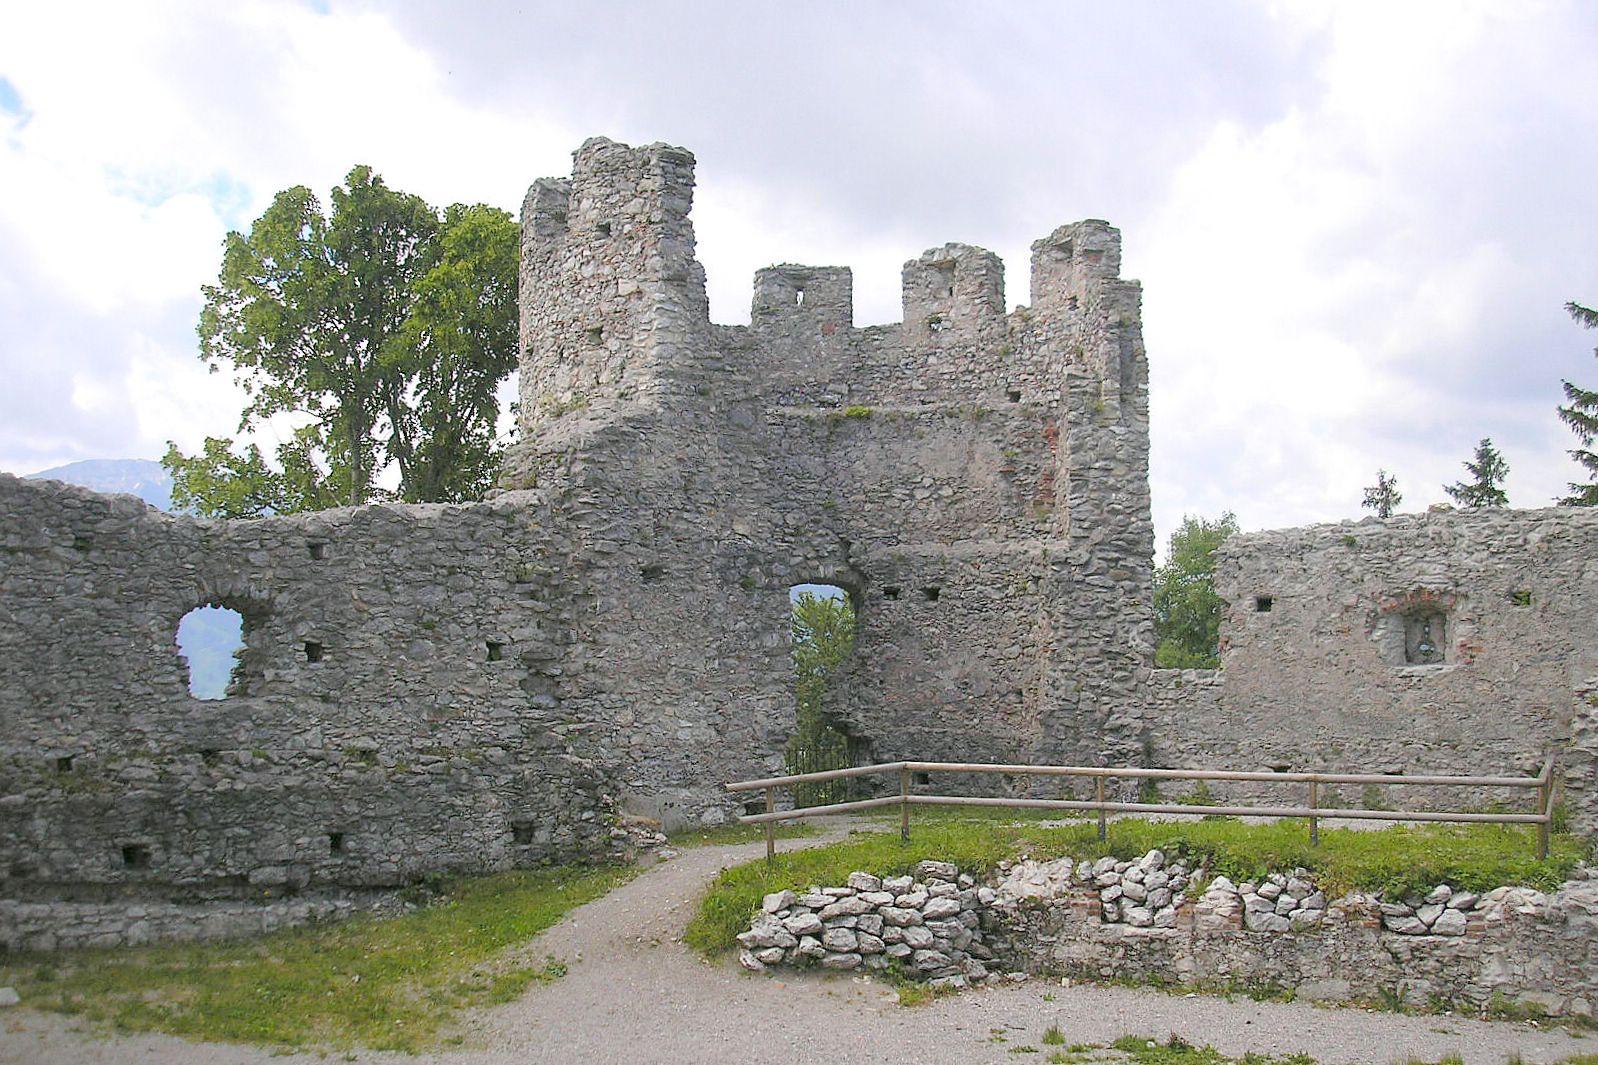 File:Burg Hohenfreyberg Suedwestturm.jpg.